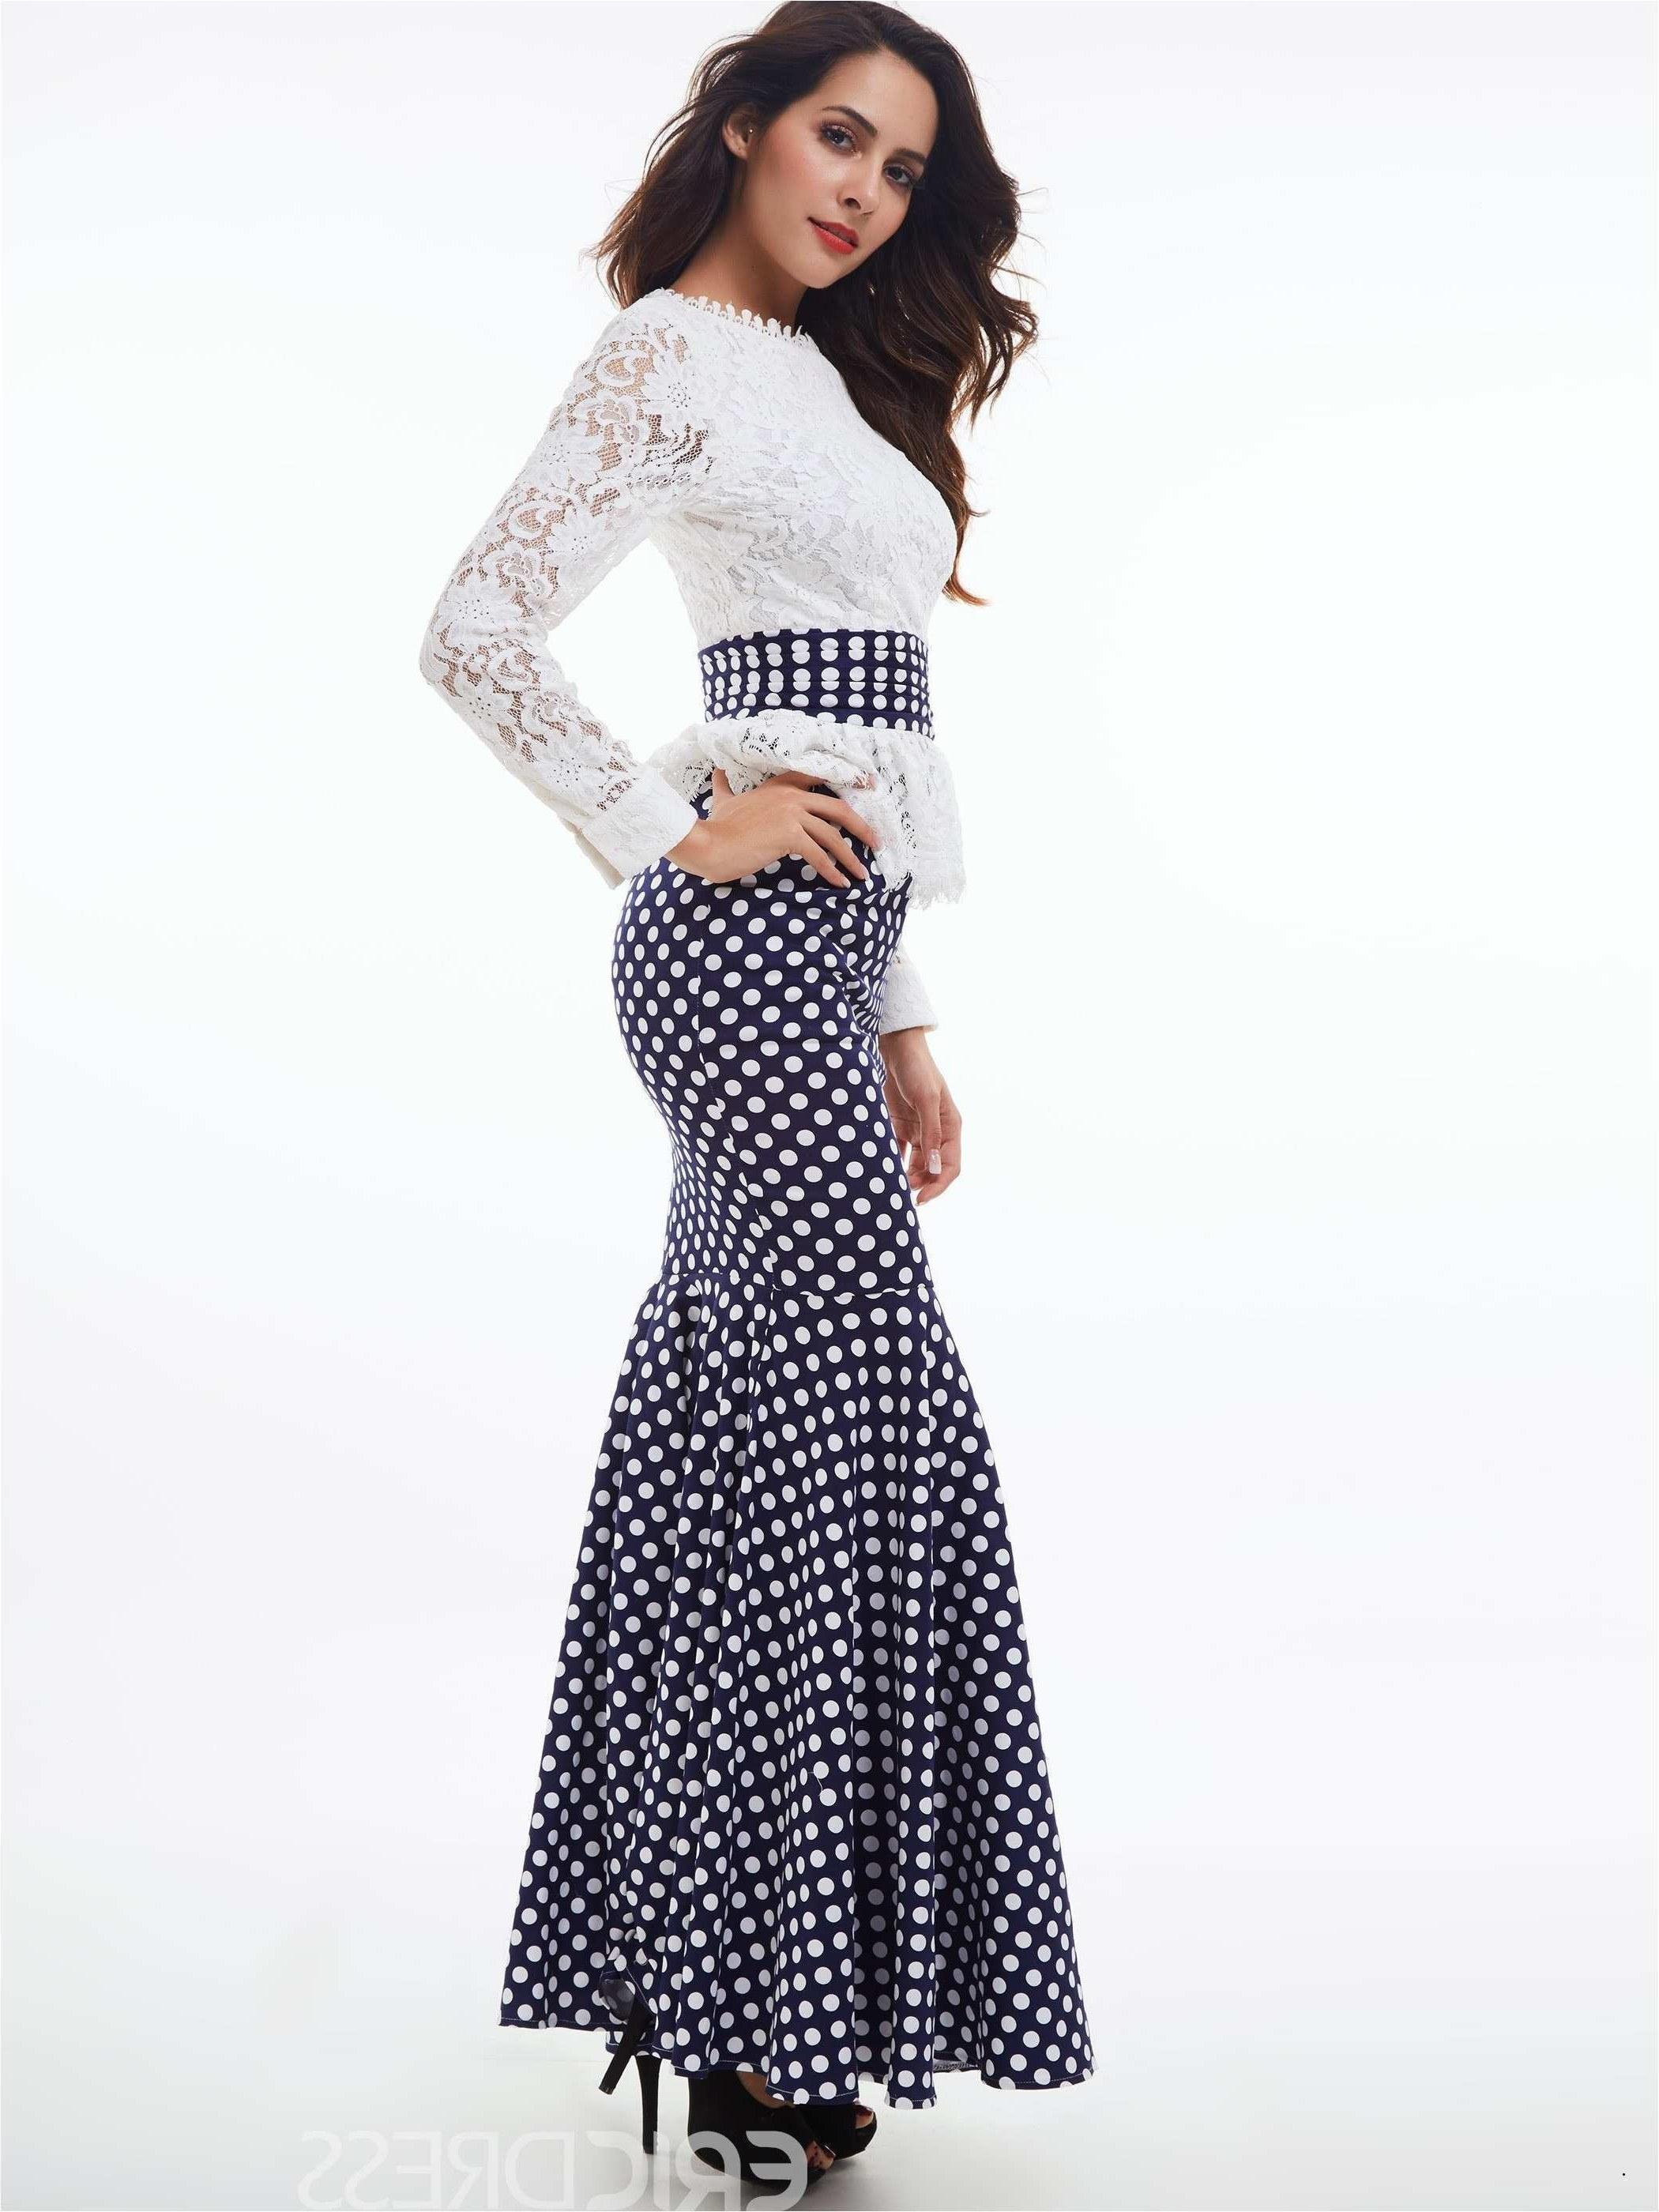 Design Baju Pengantin India Muslim Ipdd Ecehispanic